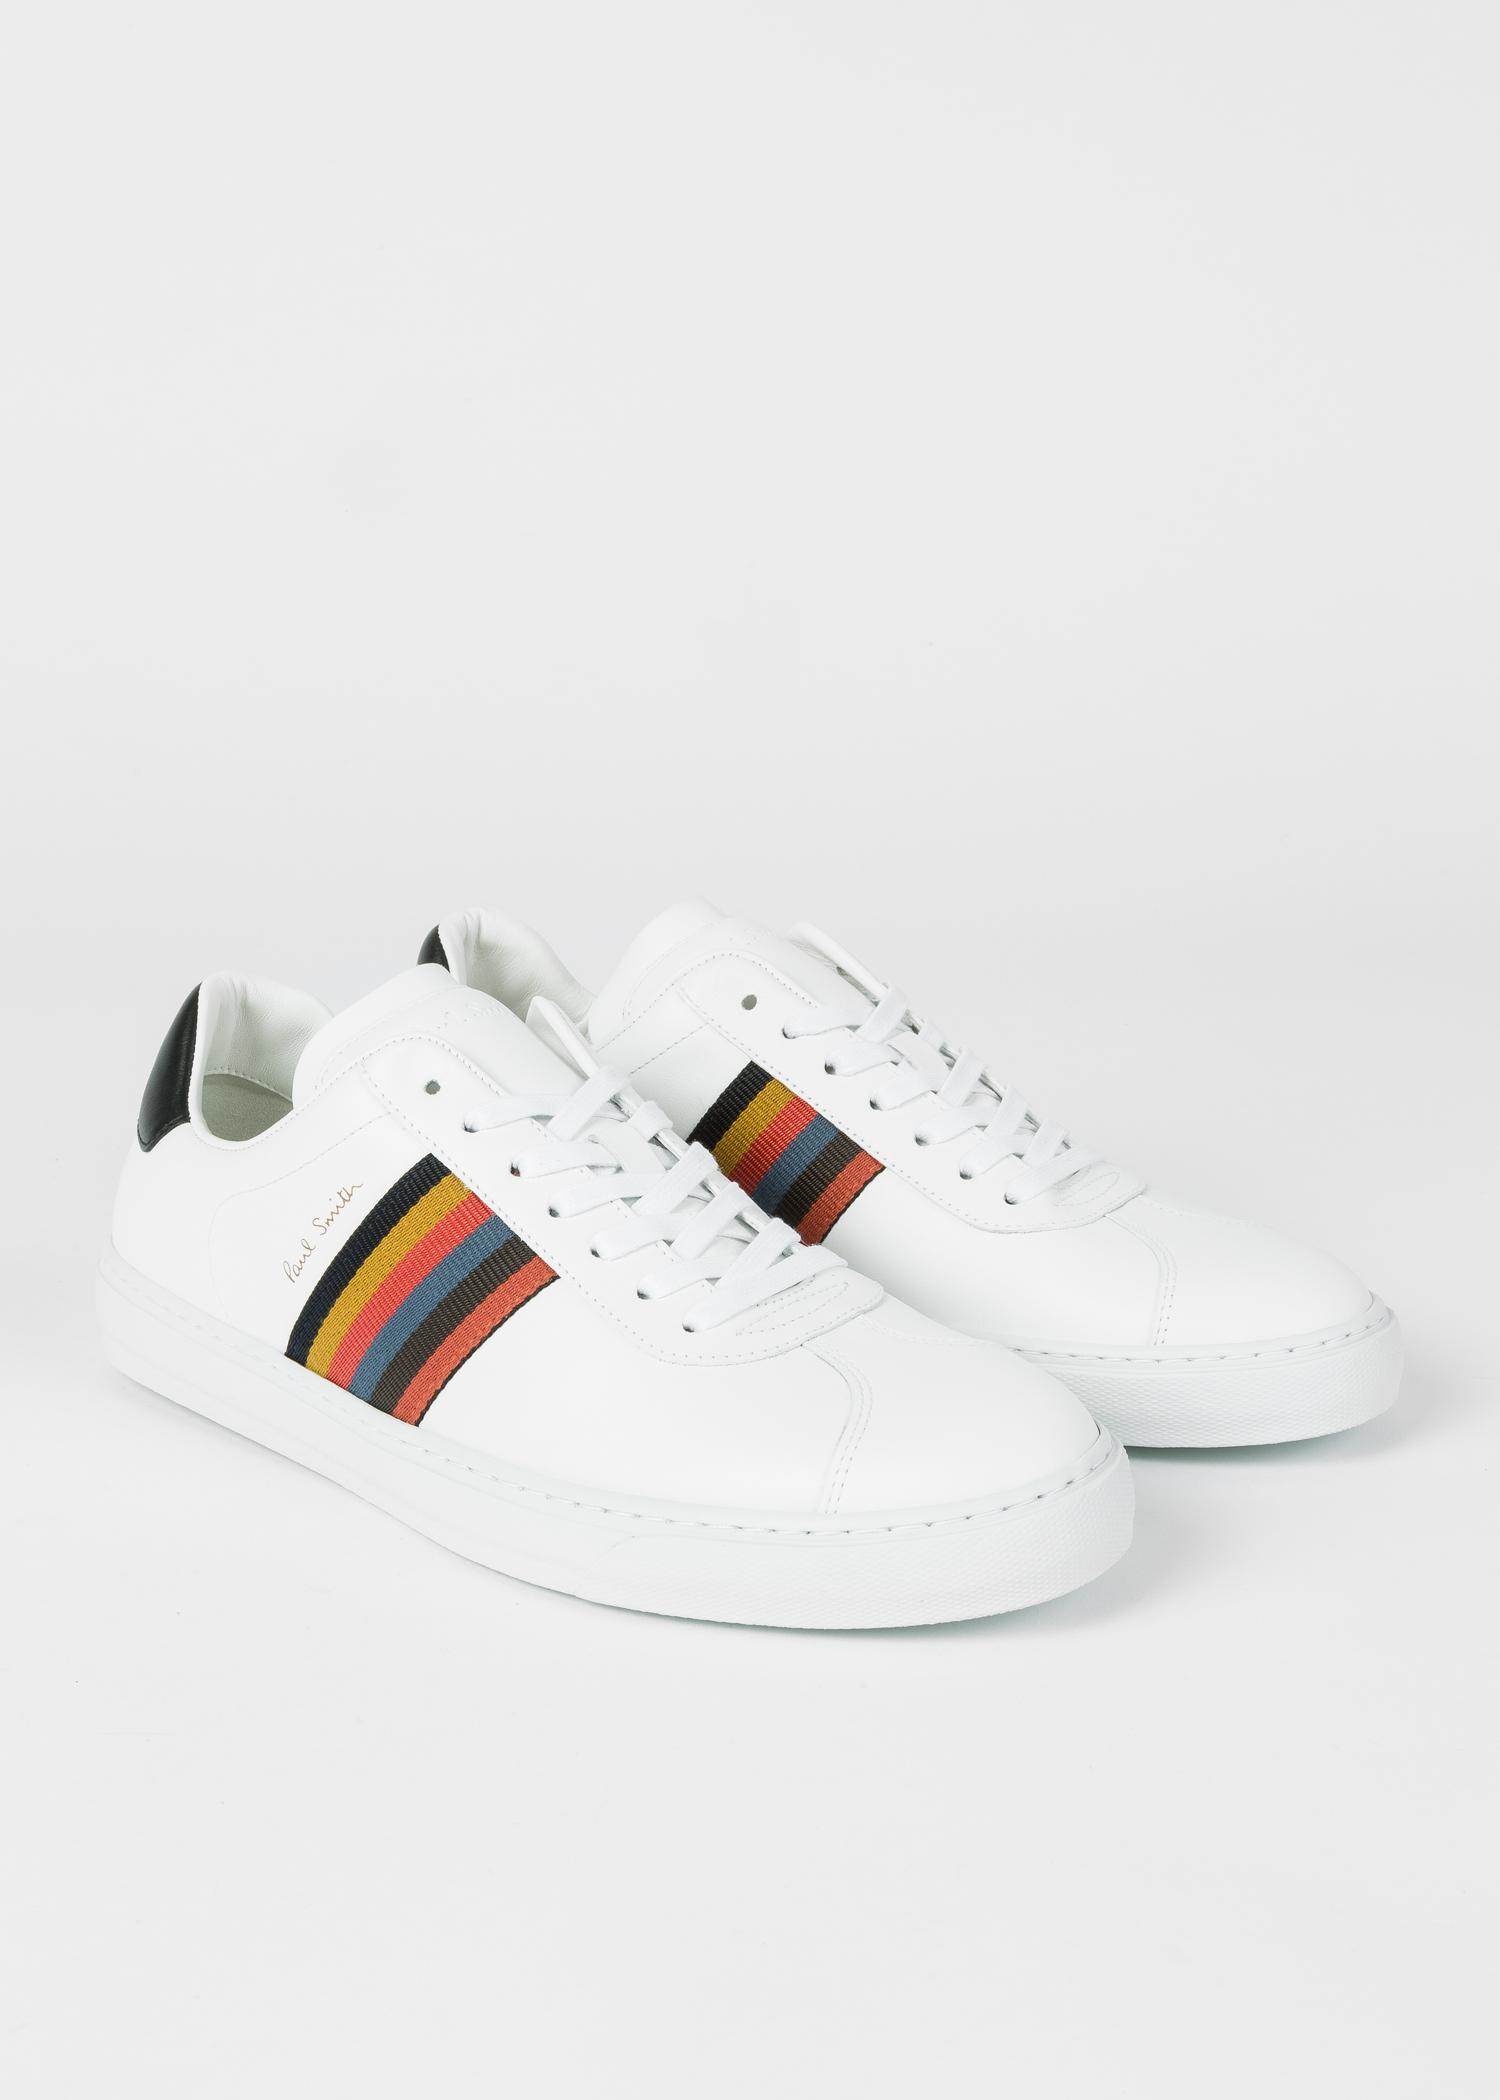 greatvarieties popular style store Men's White 'Bright Stripe' Leather 'Levon' Trainers